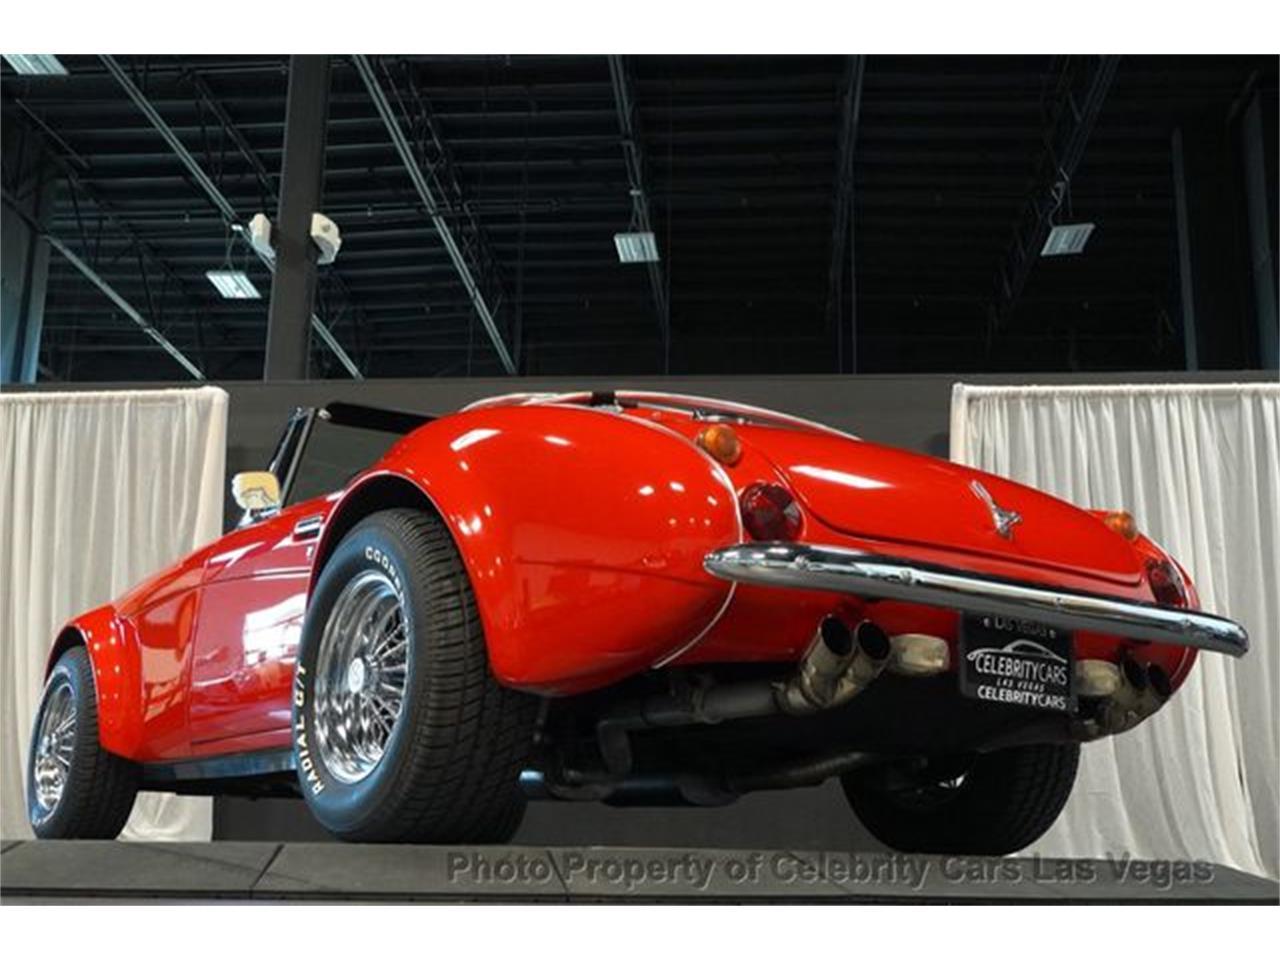 1962 Austin-Healey 3000 (CC-1386466) for sale in Las Vegas, Nevada